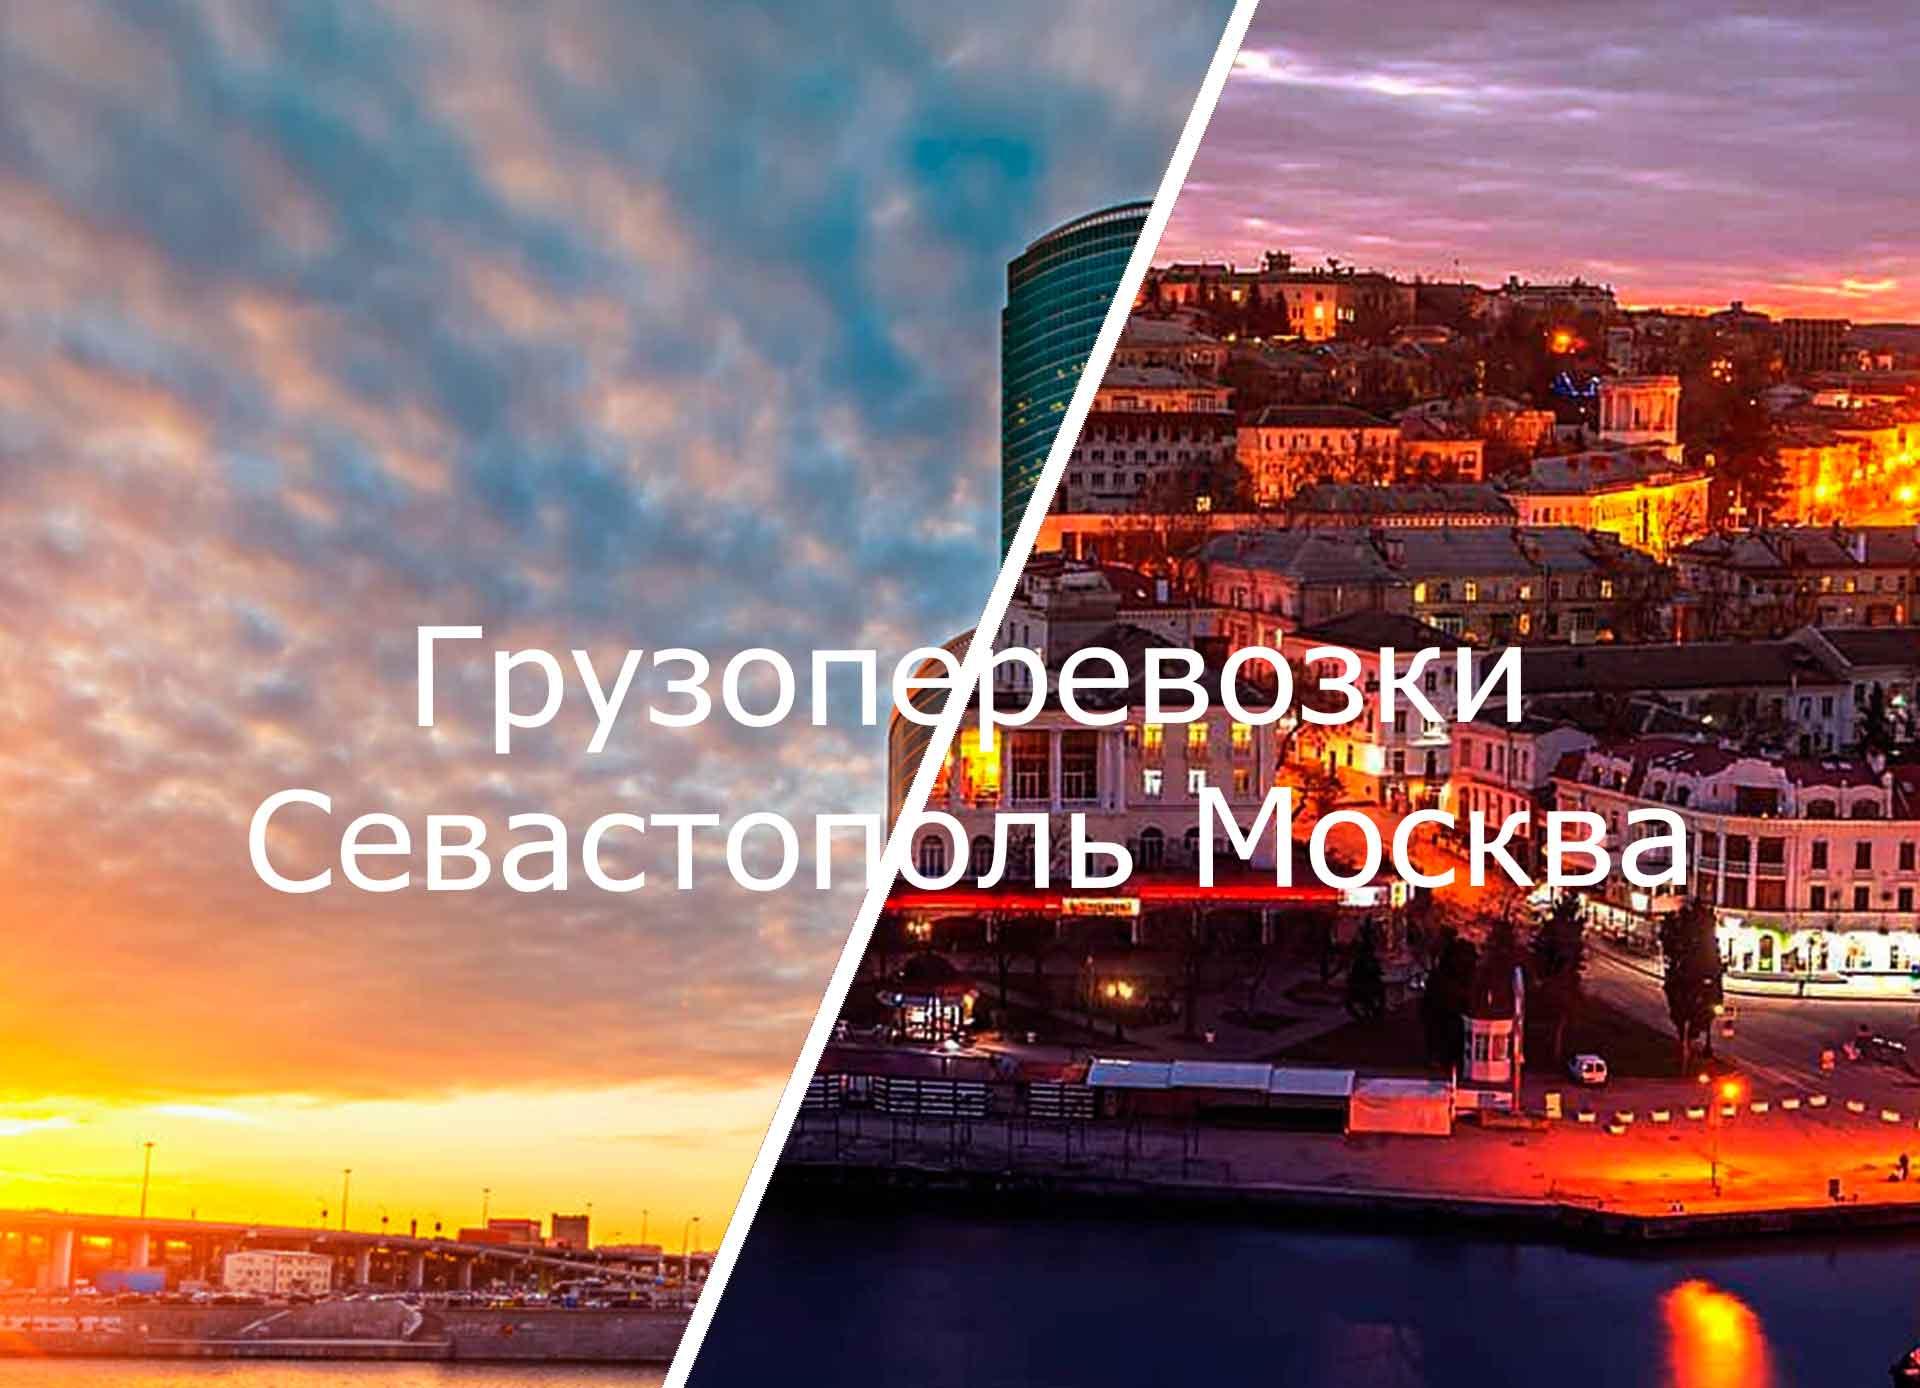 грузоперевозки севастополь москва